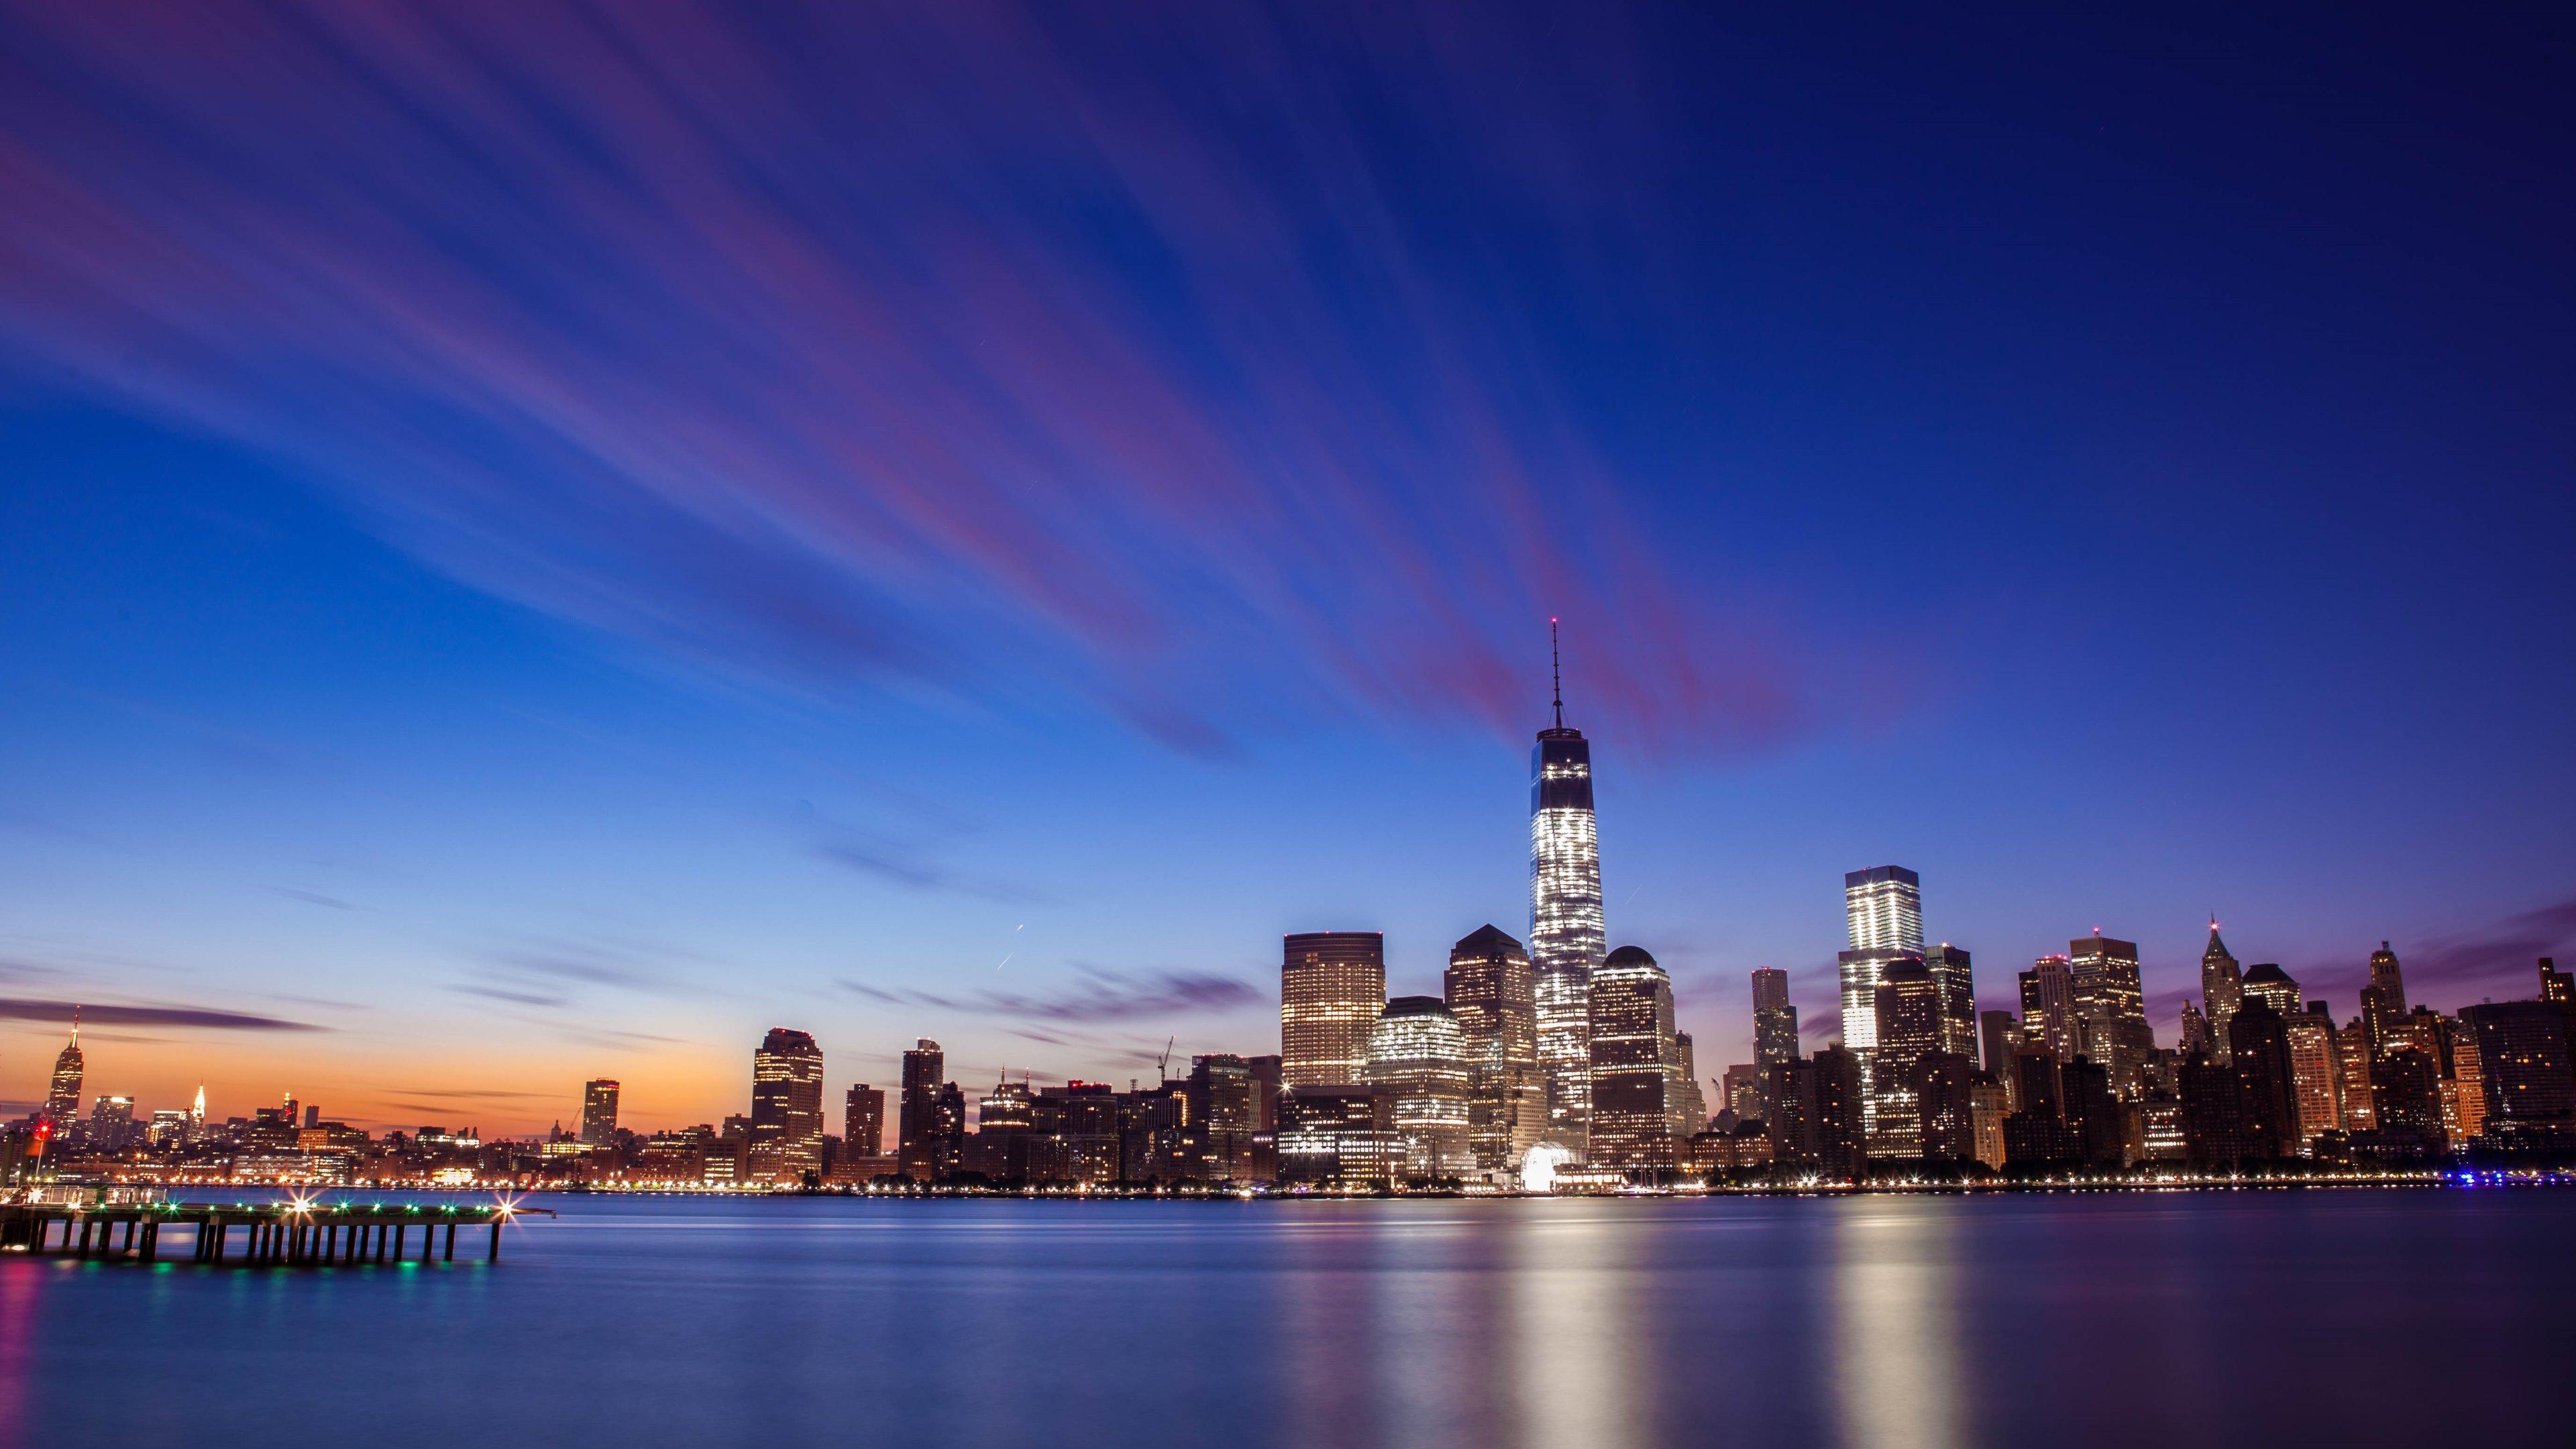 48+ Wallpaper New York Skyline on WallpaperSafari